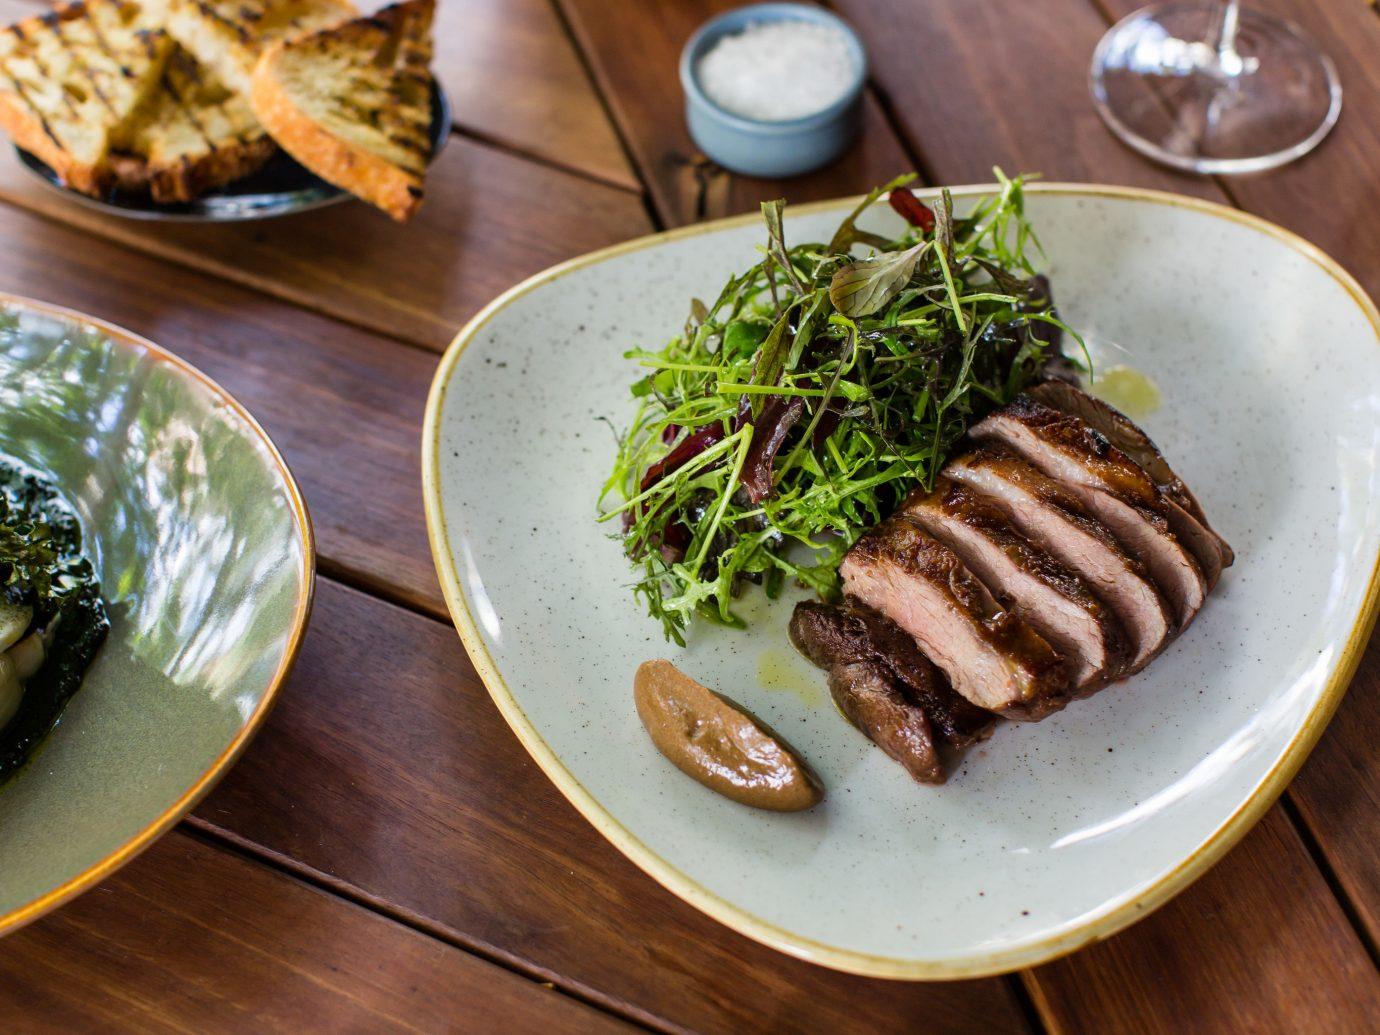 Trip Ideas plate table food dish meat wooden meal restaurant steak produce cuisine dinner several vegetable piece de resistance